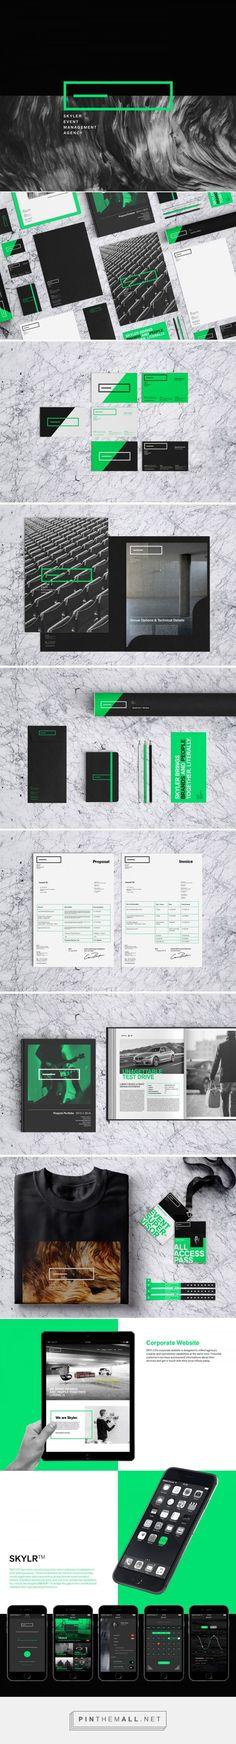 SKYLER Event Management Agency Branding by Samet K.   Fivestar Branding Agency – Design and Branding Agency & Curated Inspiration Gallery